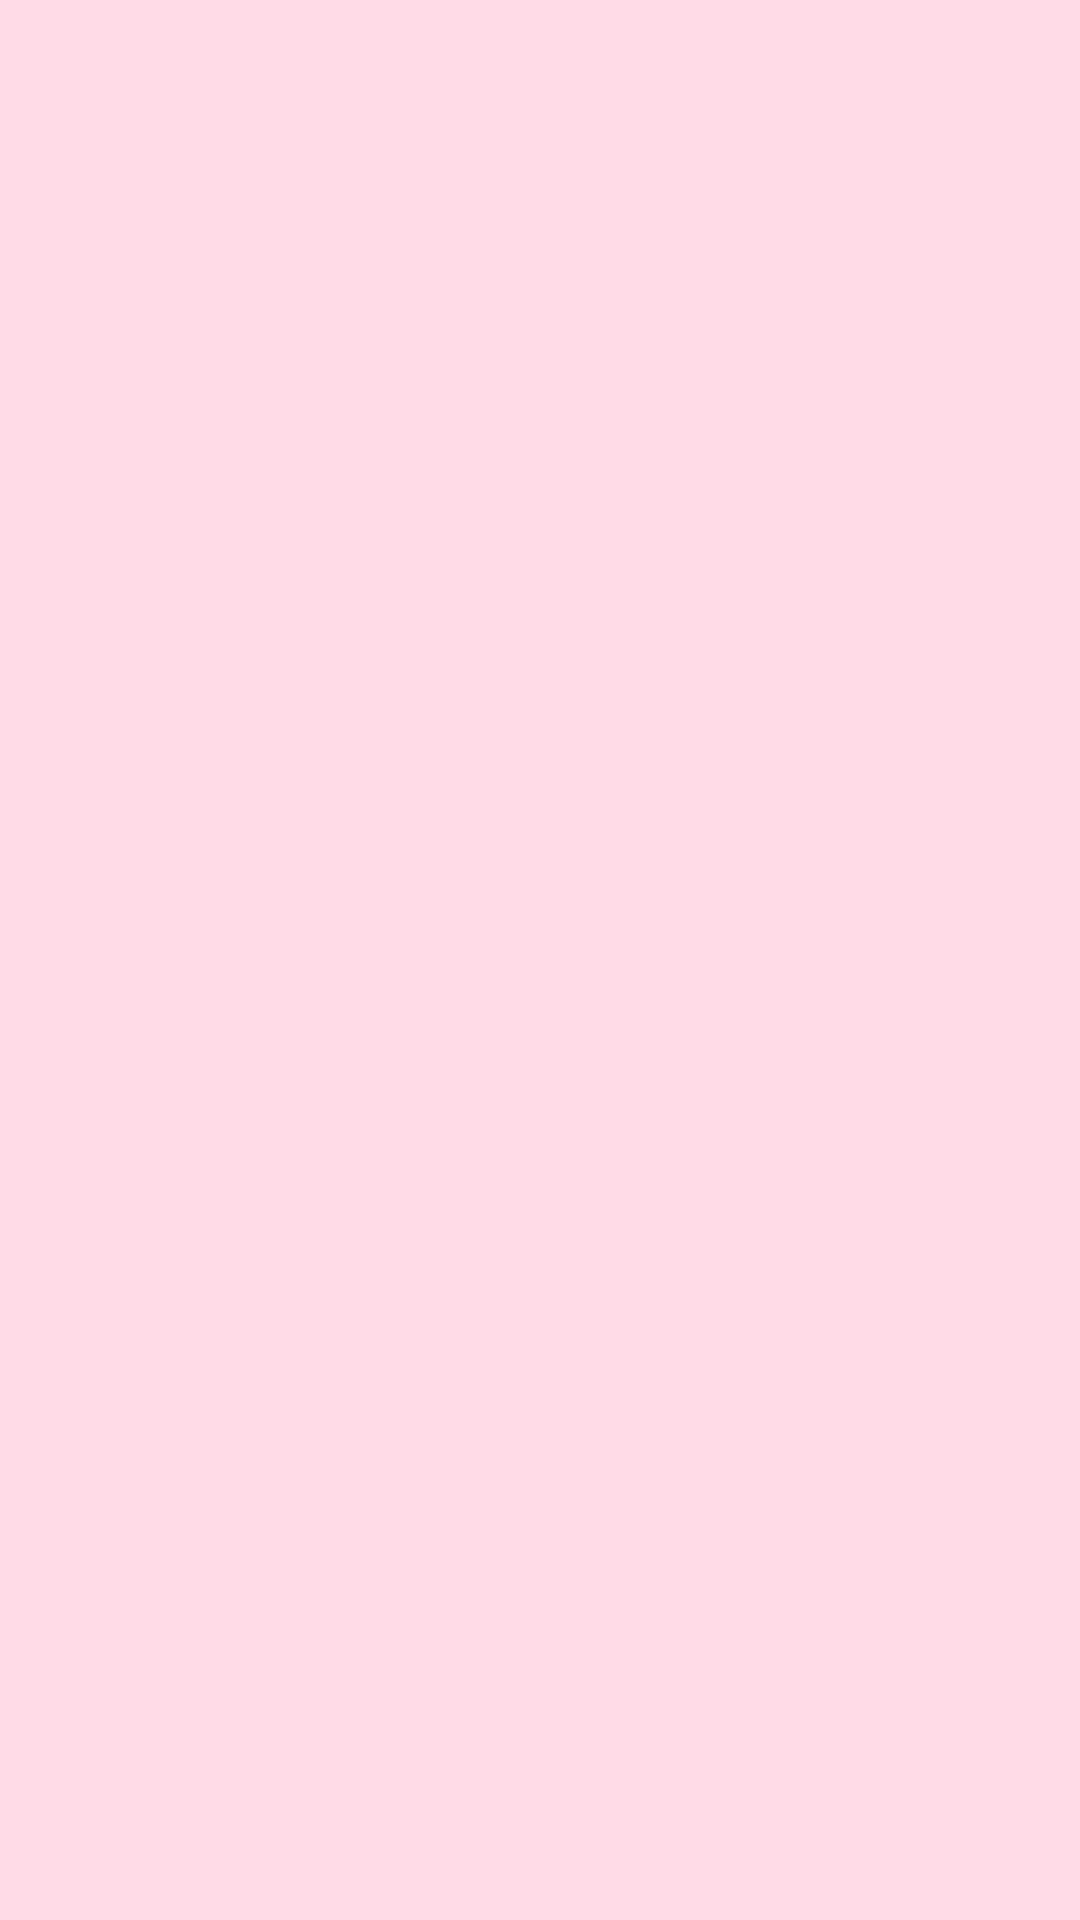 Plain Pink Wallpapers Top Free Plain Pink Backgrounds Wallpaperaccess